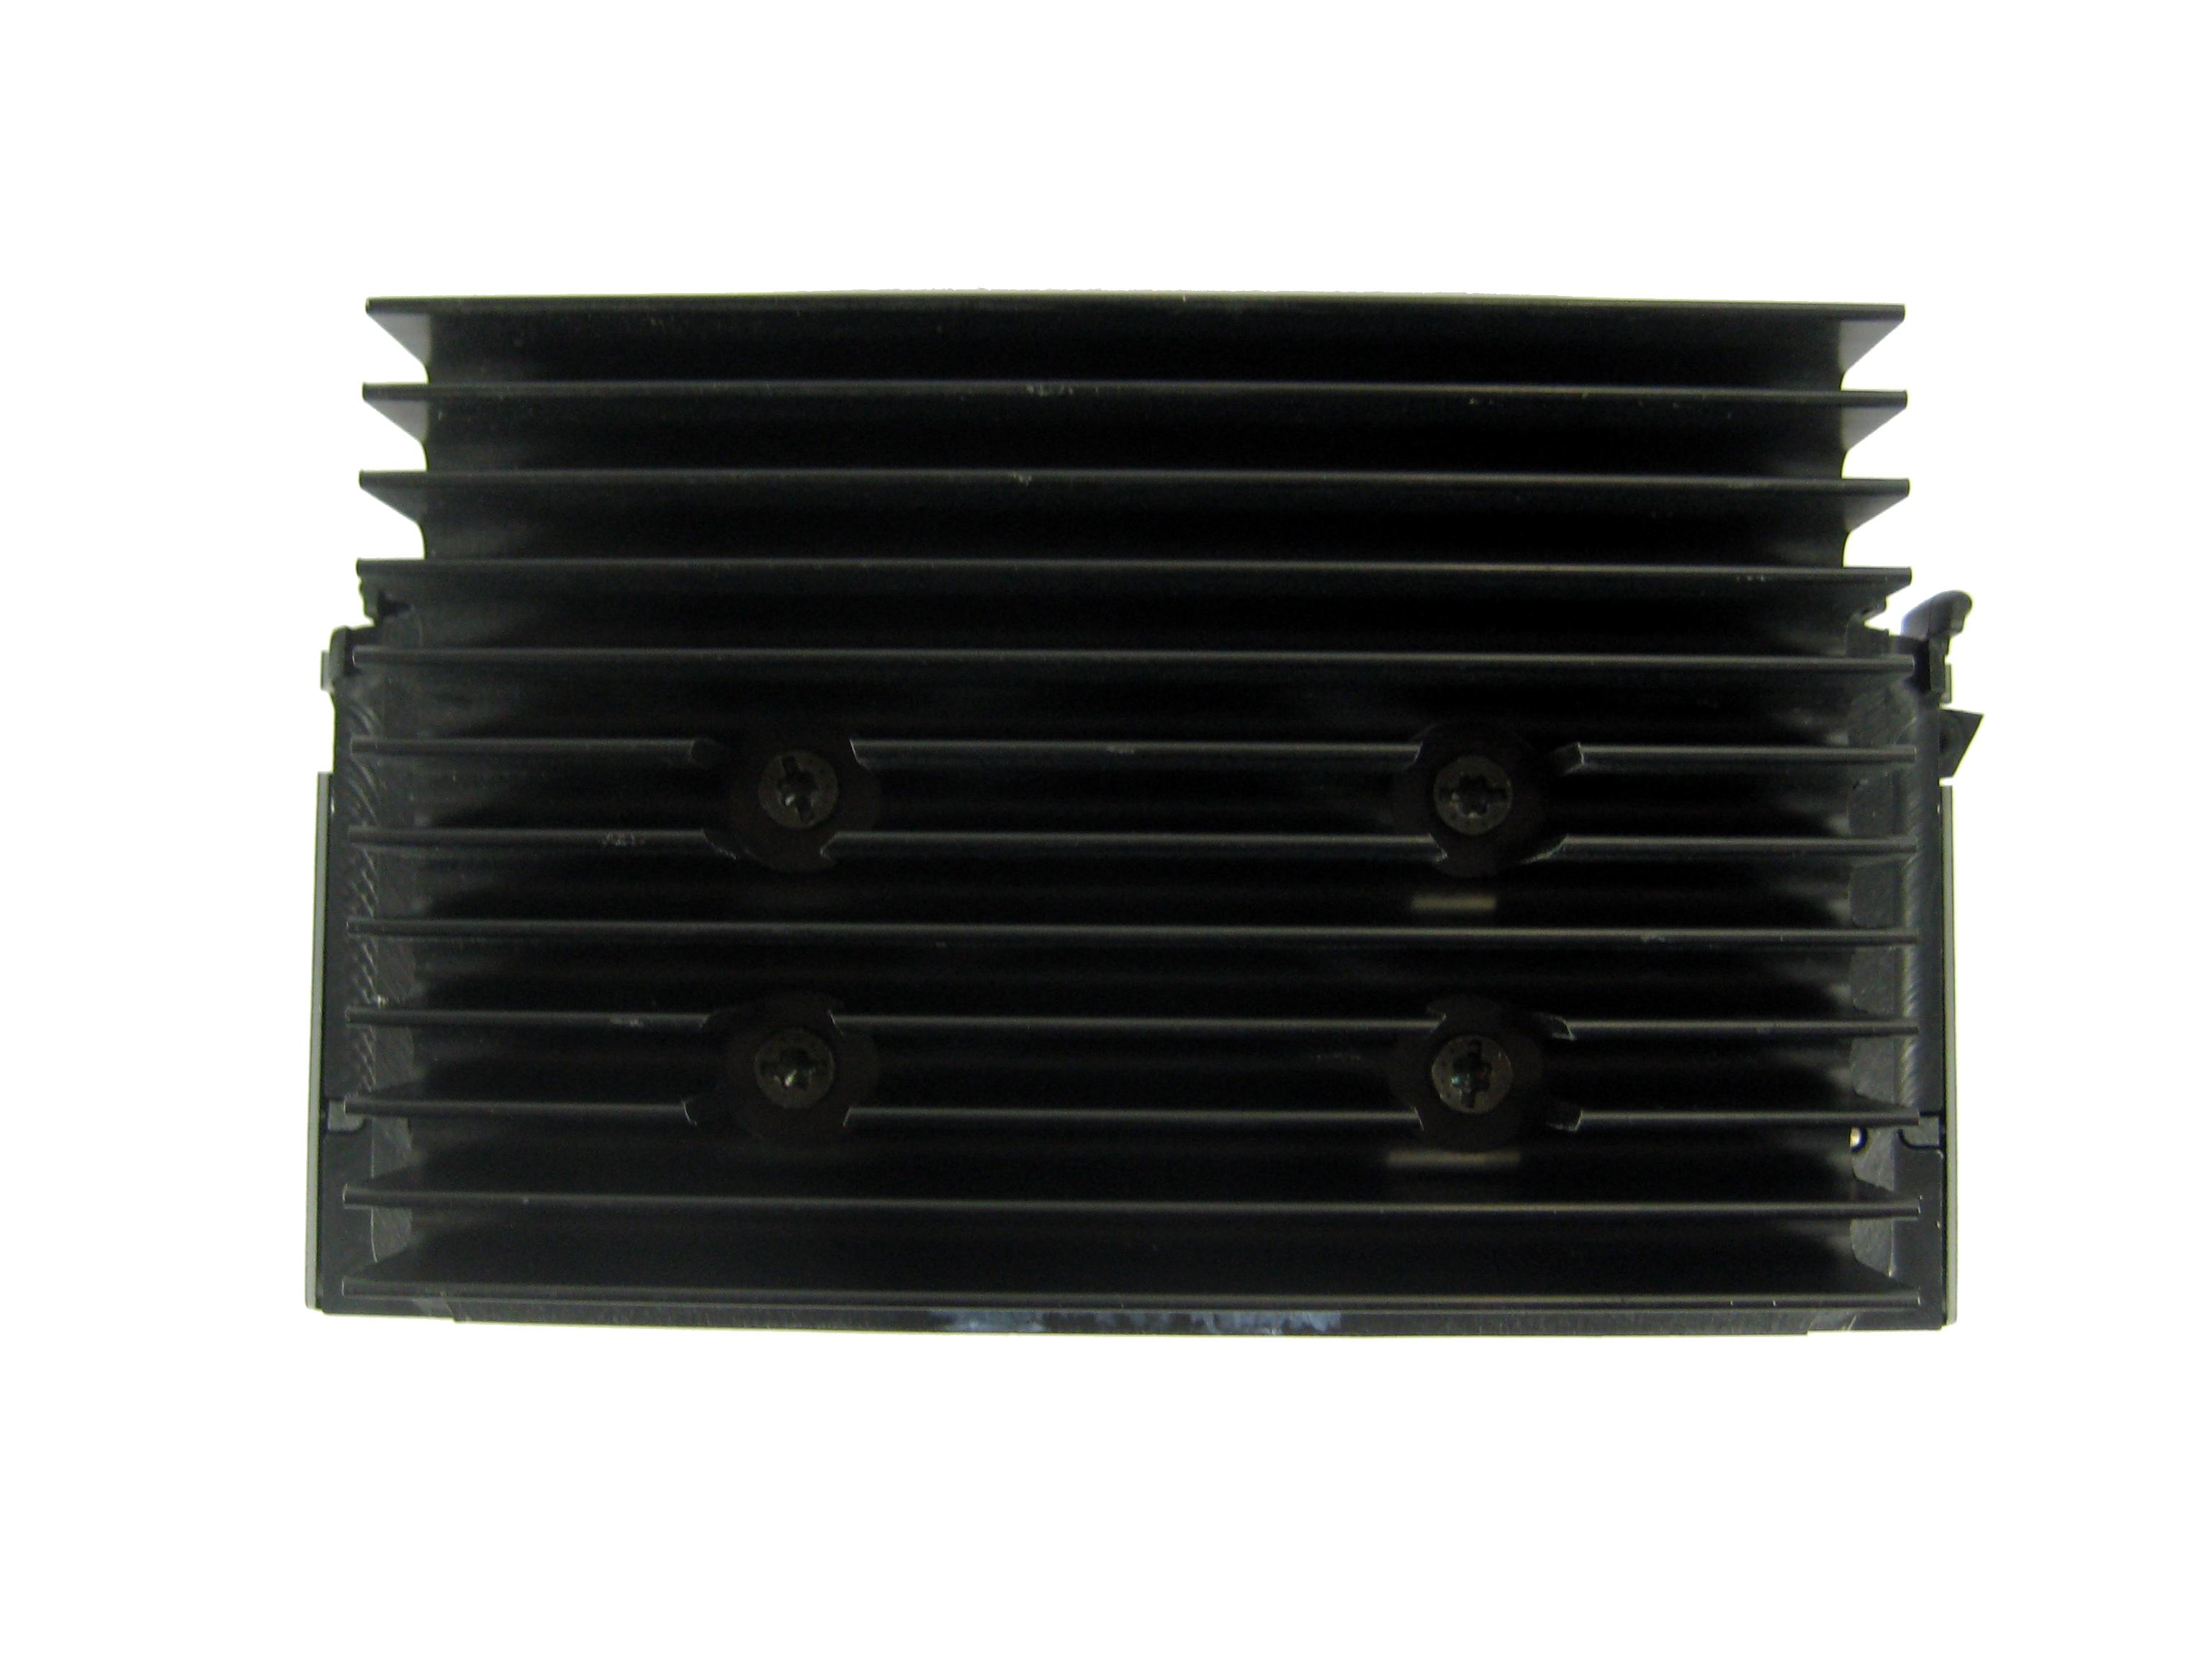 Compaq 313660-001 Intel Pentium 2 350MHz SL2U3 Slot 1 CPU - 269609-001 Heatsink